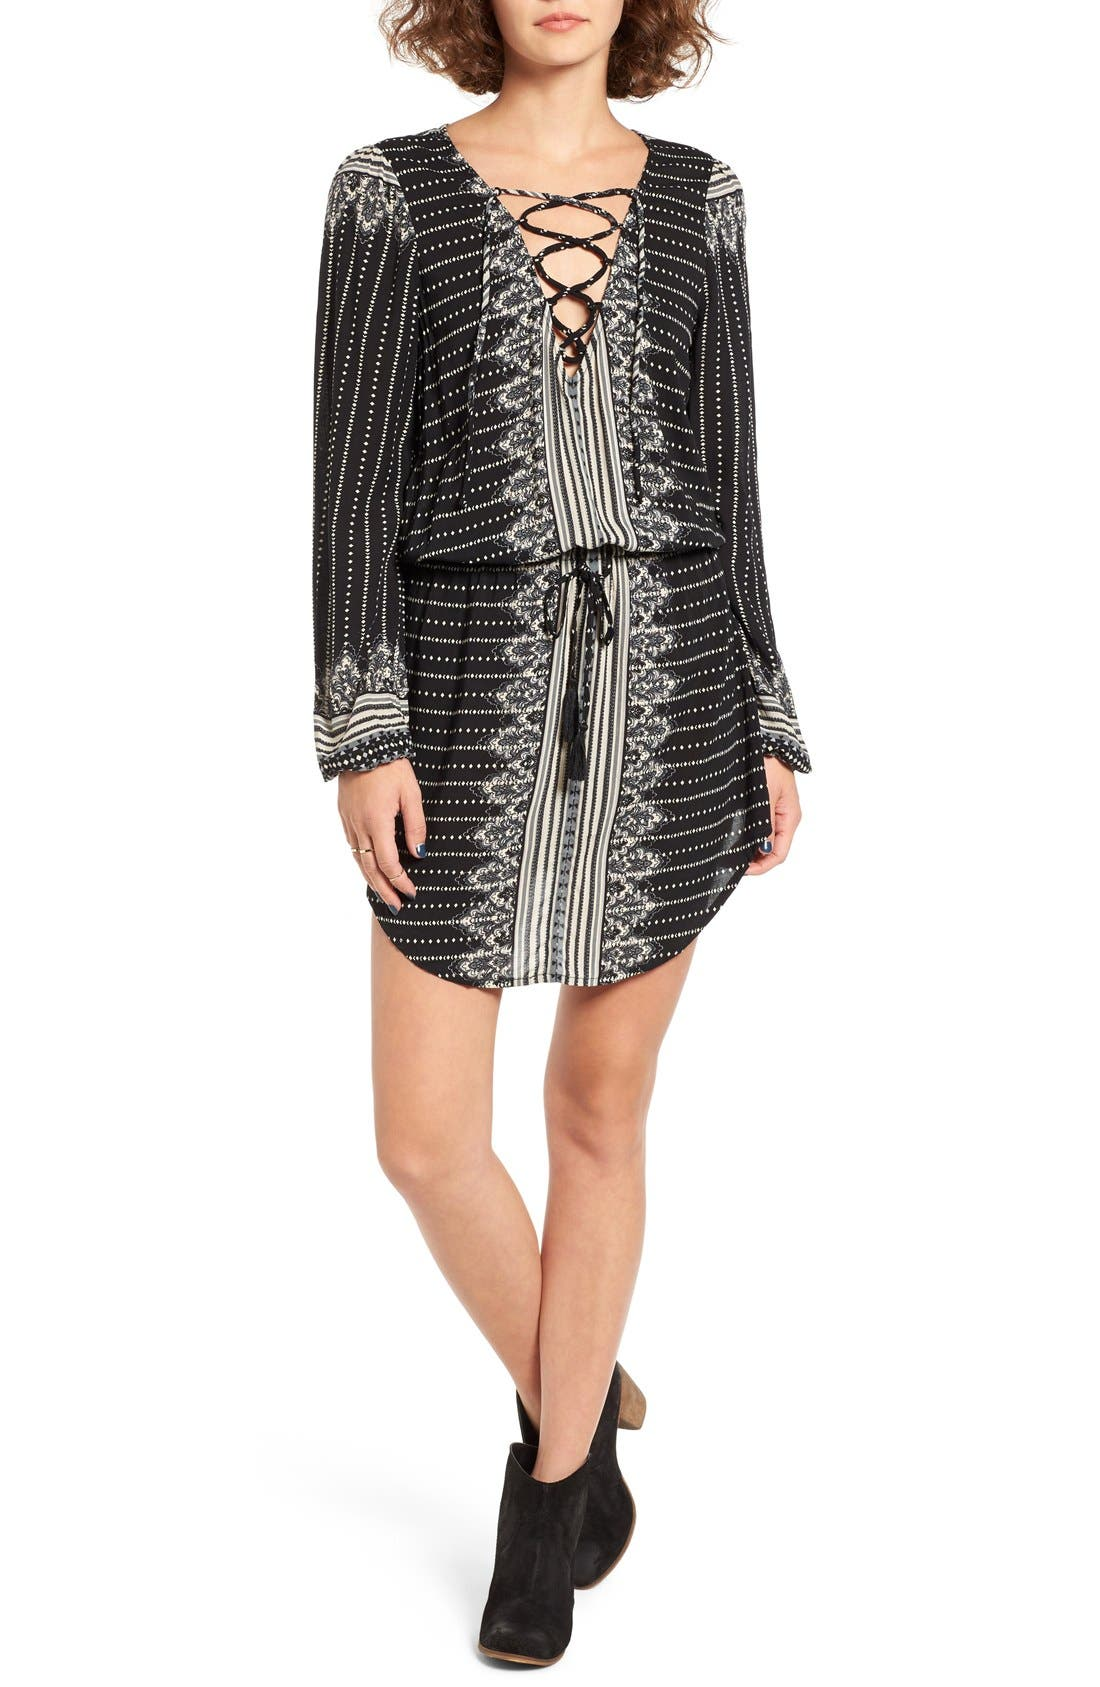 Alternate Image 1 Selected - Rip Curl Winter Bird Print Lace-Up Dress